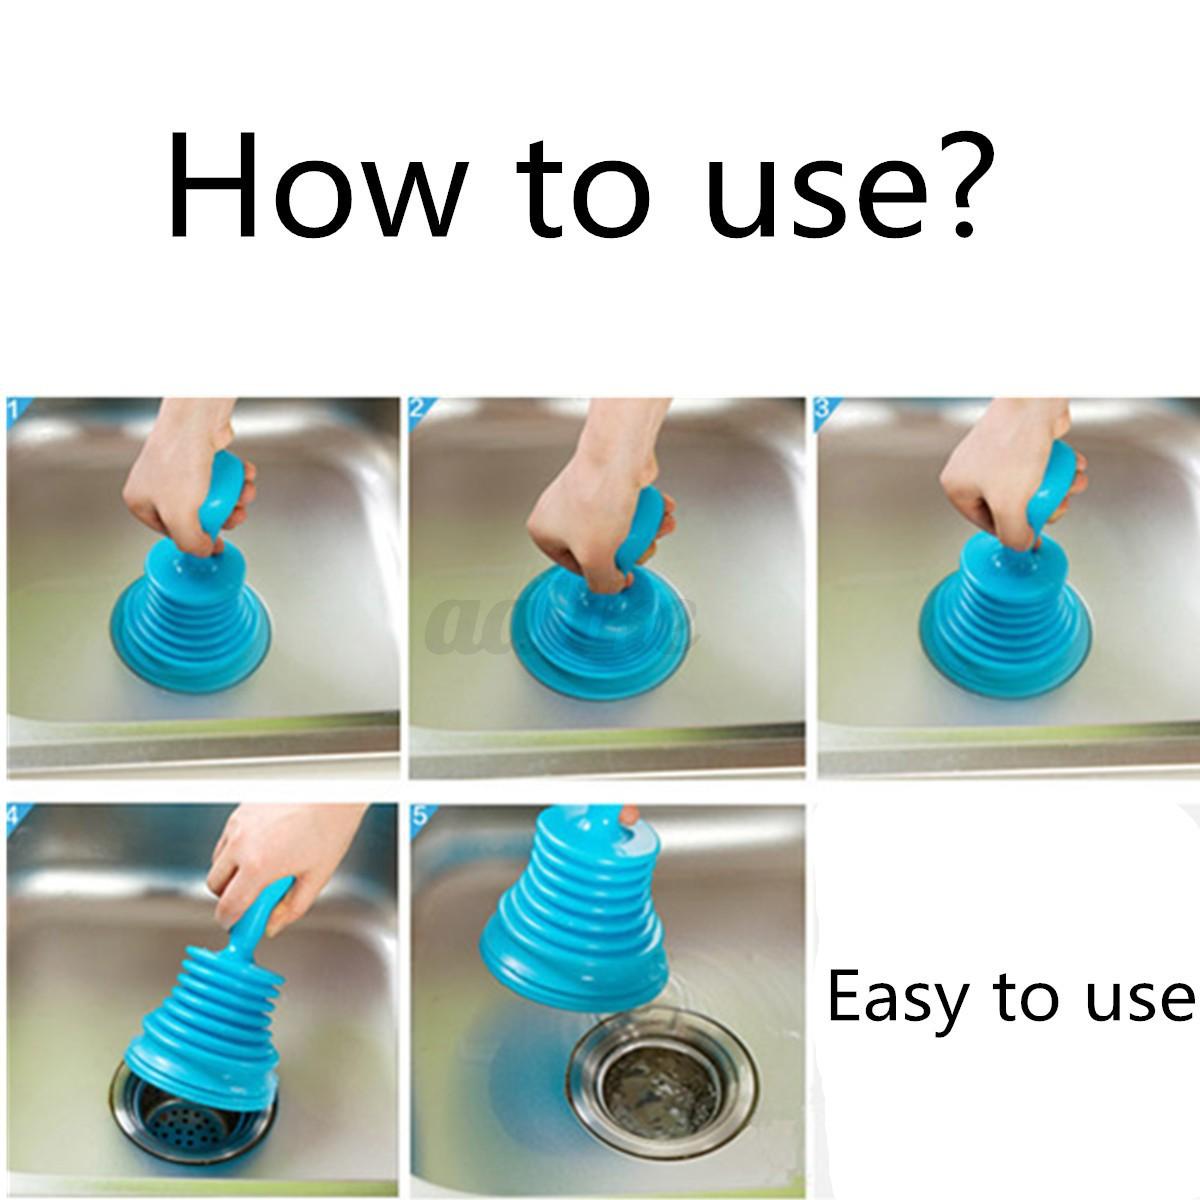 sink plunger blocked toilet drain unblock pipe kitchen cleaning cleaner bathr. Black Bedroom Furniture Sets. Home Design Ideas